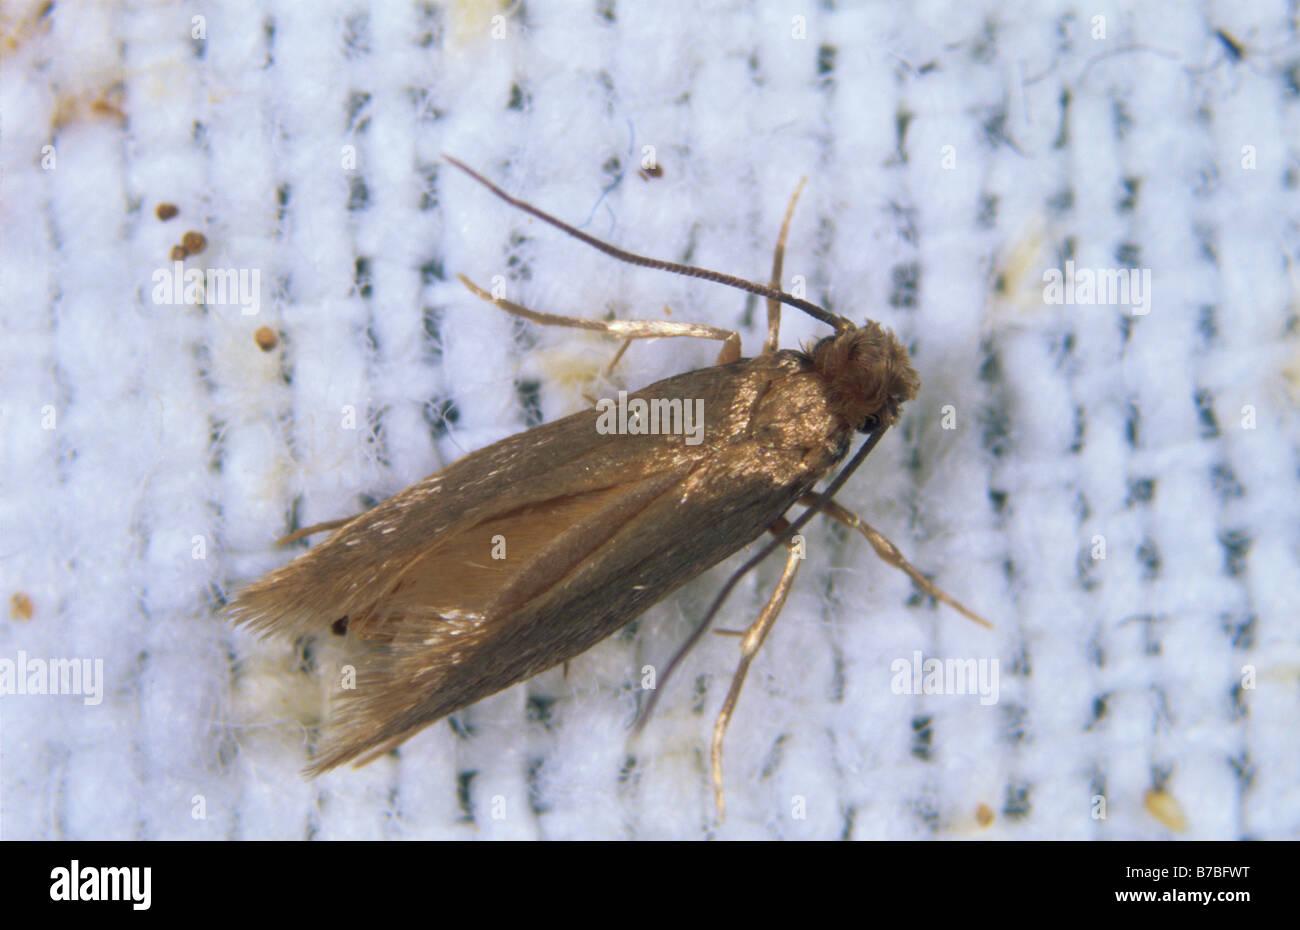 Clothes moth Tineola biselliella adult moth on fabric - Stock Image